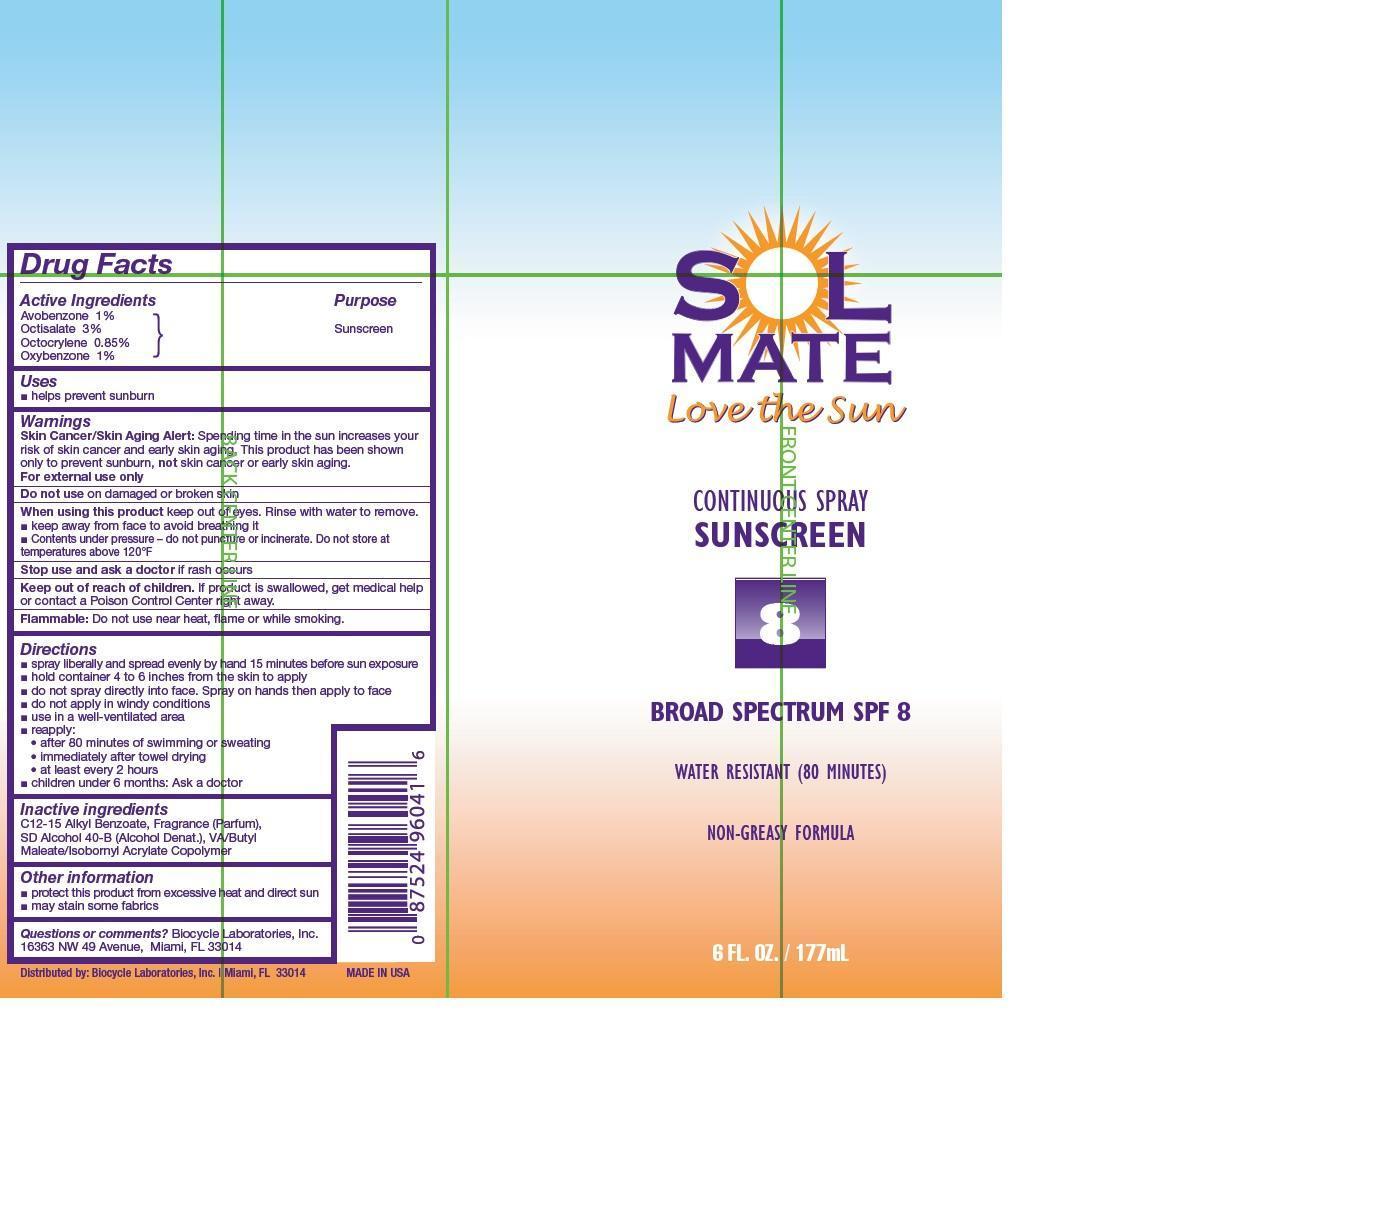 Solmate Broad Spectrum Spf 8 (Avobenzone, Octisalate, Octocrylene, And Oxybenzone) Aerosol, Spray [Prime Packaging, Inc.]